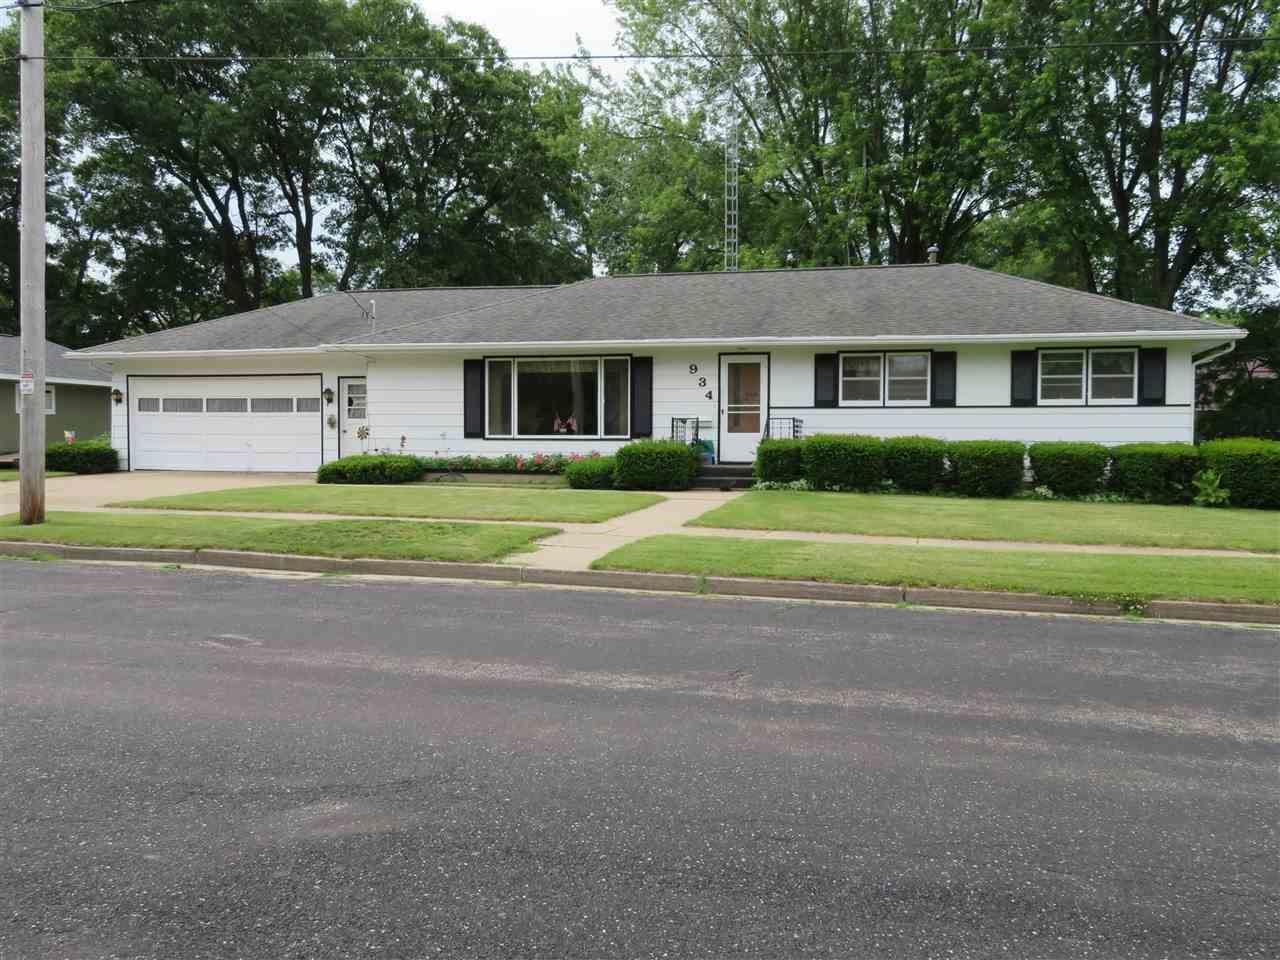 934 Seymour St, Reedsburg, WI 53959 - #: 1887278